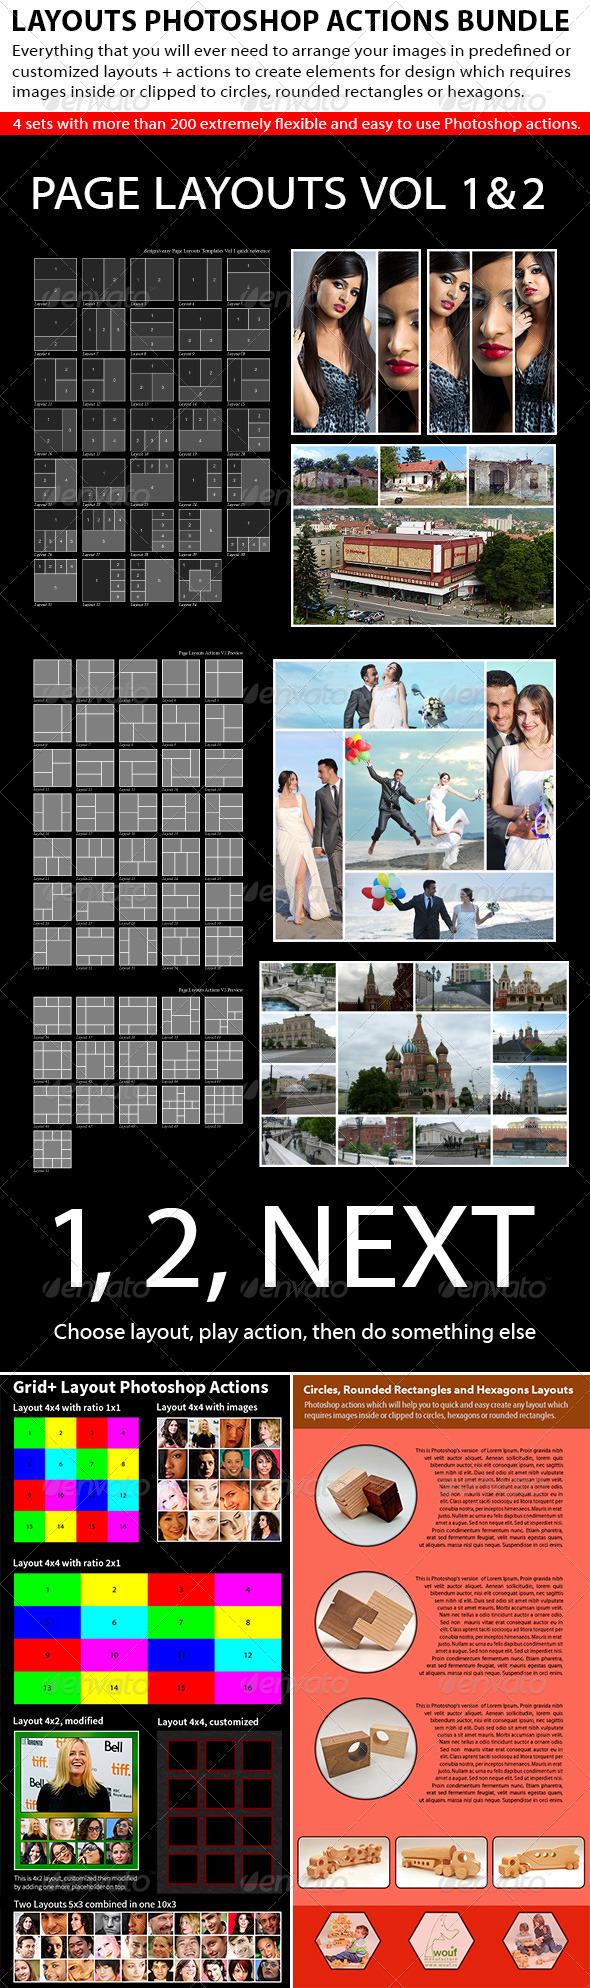 GraphicRiver Layouts Photoshop Actions Bundle 4801747